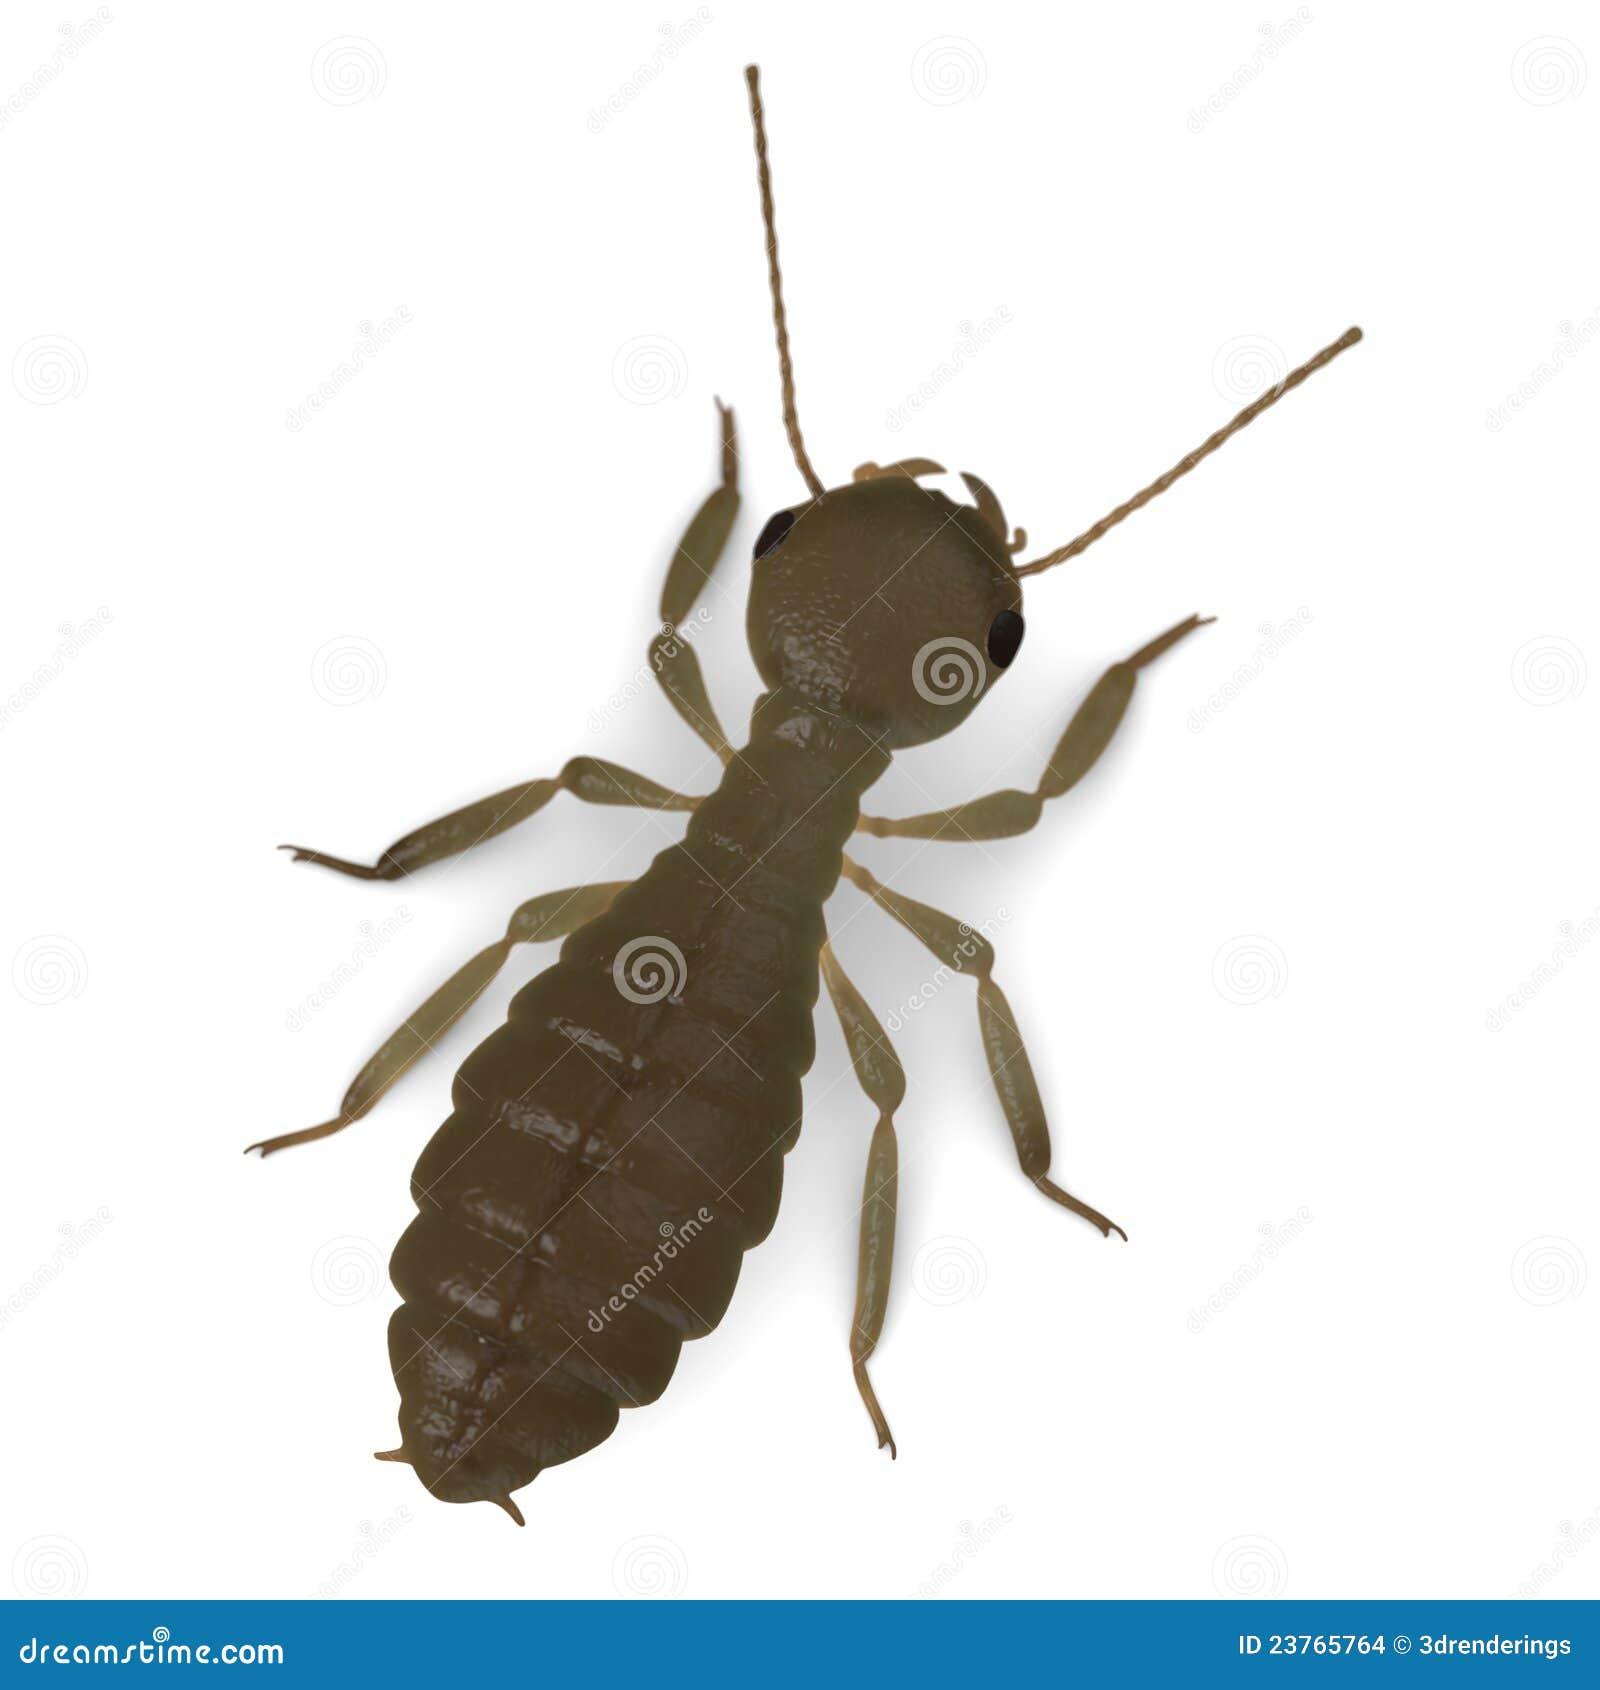 Termite worker - photo#24